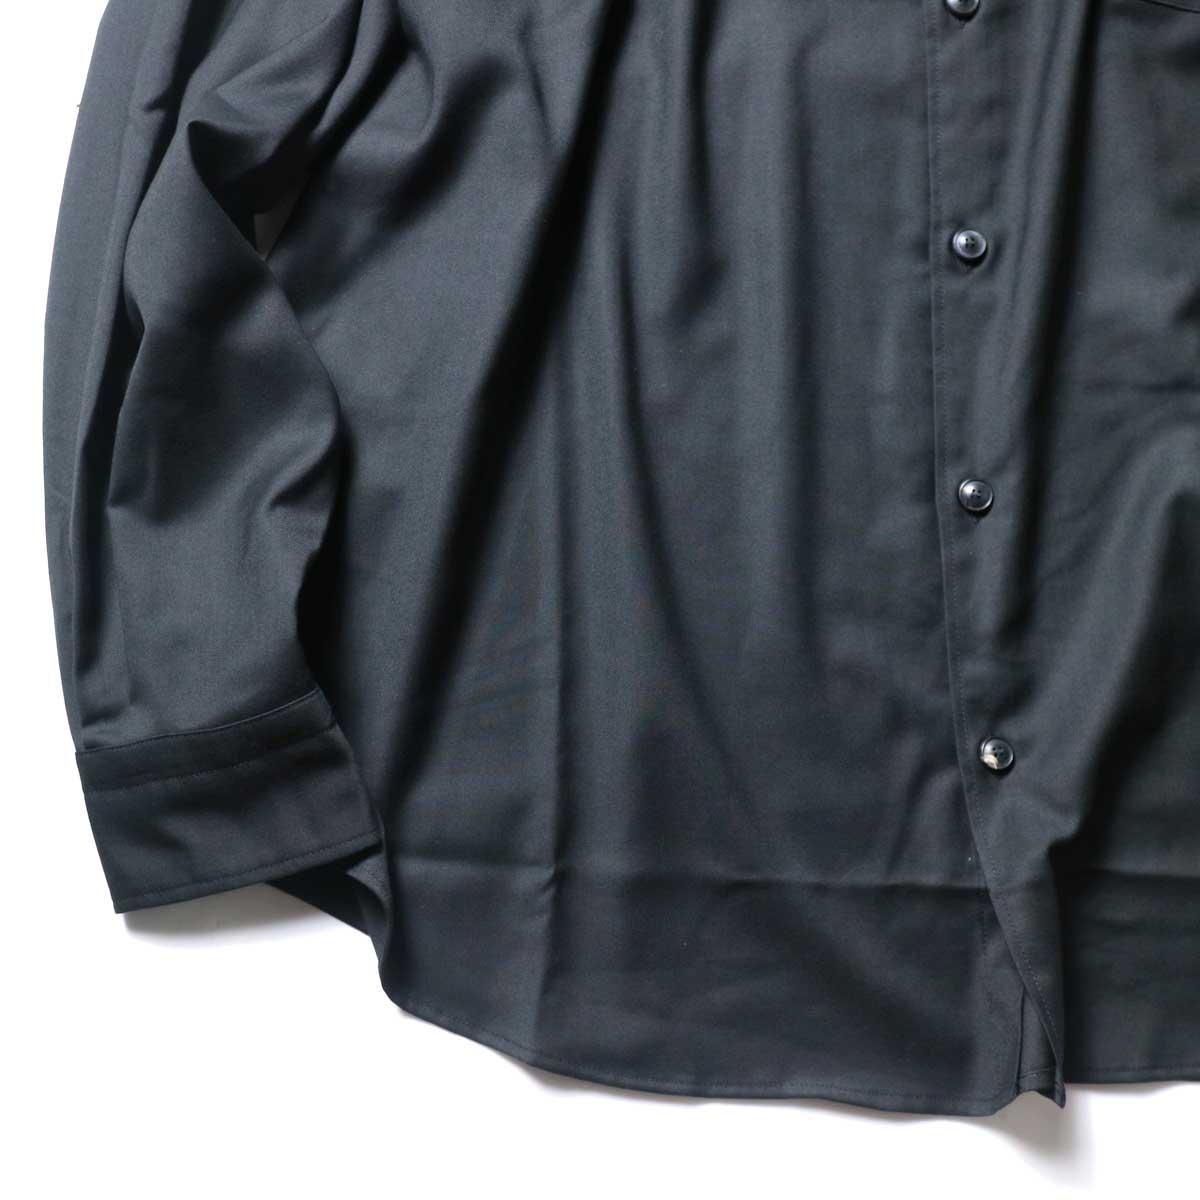 alvana / Wrinkle Proof Wide Shirts (Black)袖、裾